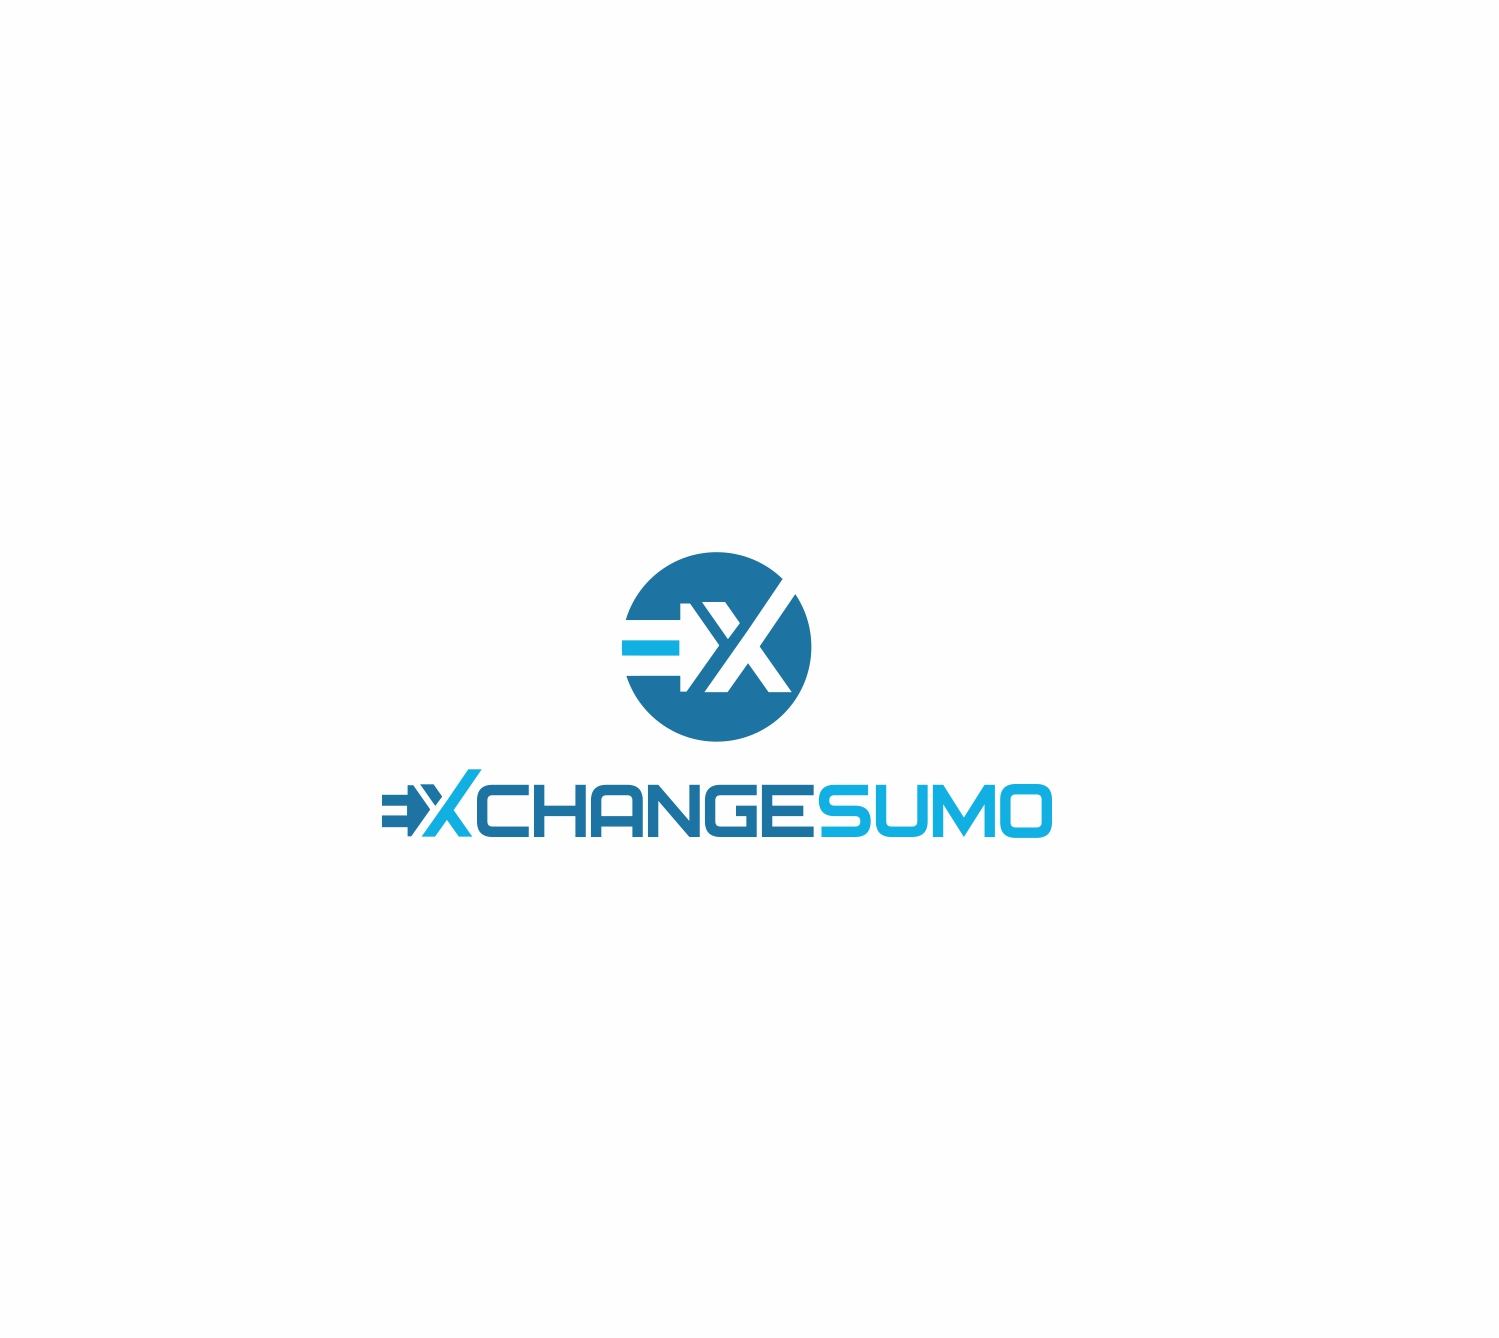 Логотип для мониторинга обменников фото f_6465baa0e824ce40.jpg